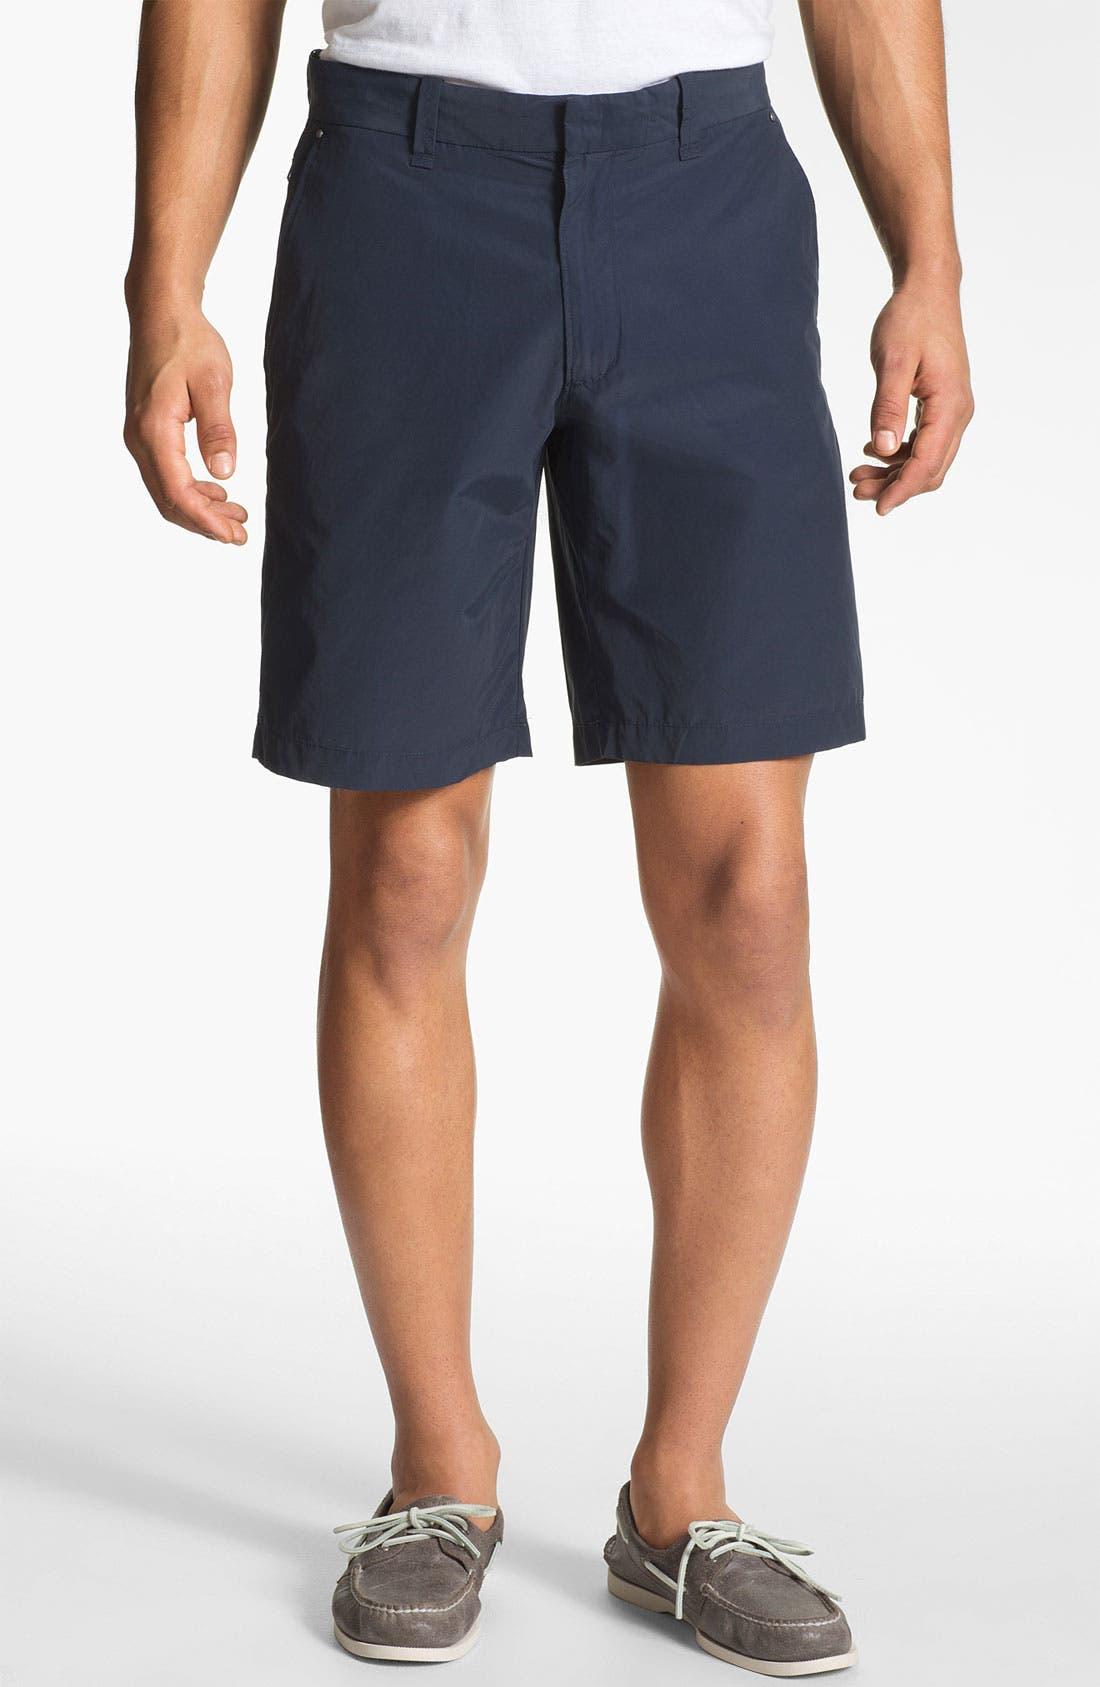 Alternate Image 1 Selected - Victorinox Swiss Army® 'Mason' Flat Front Shorts